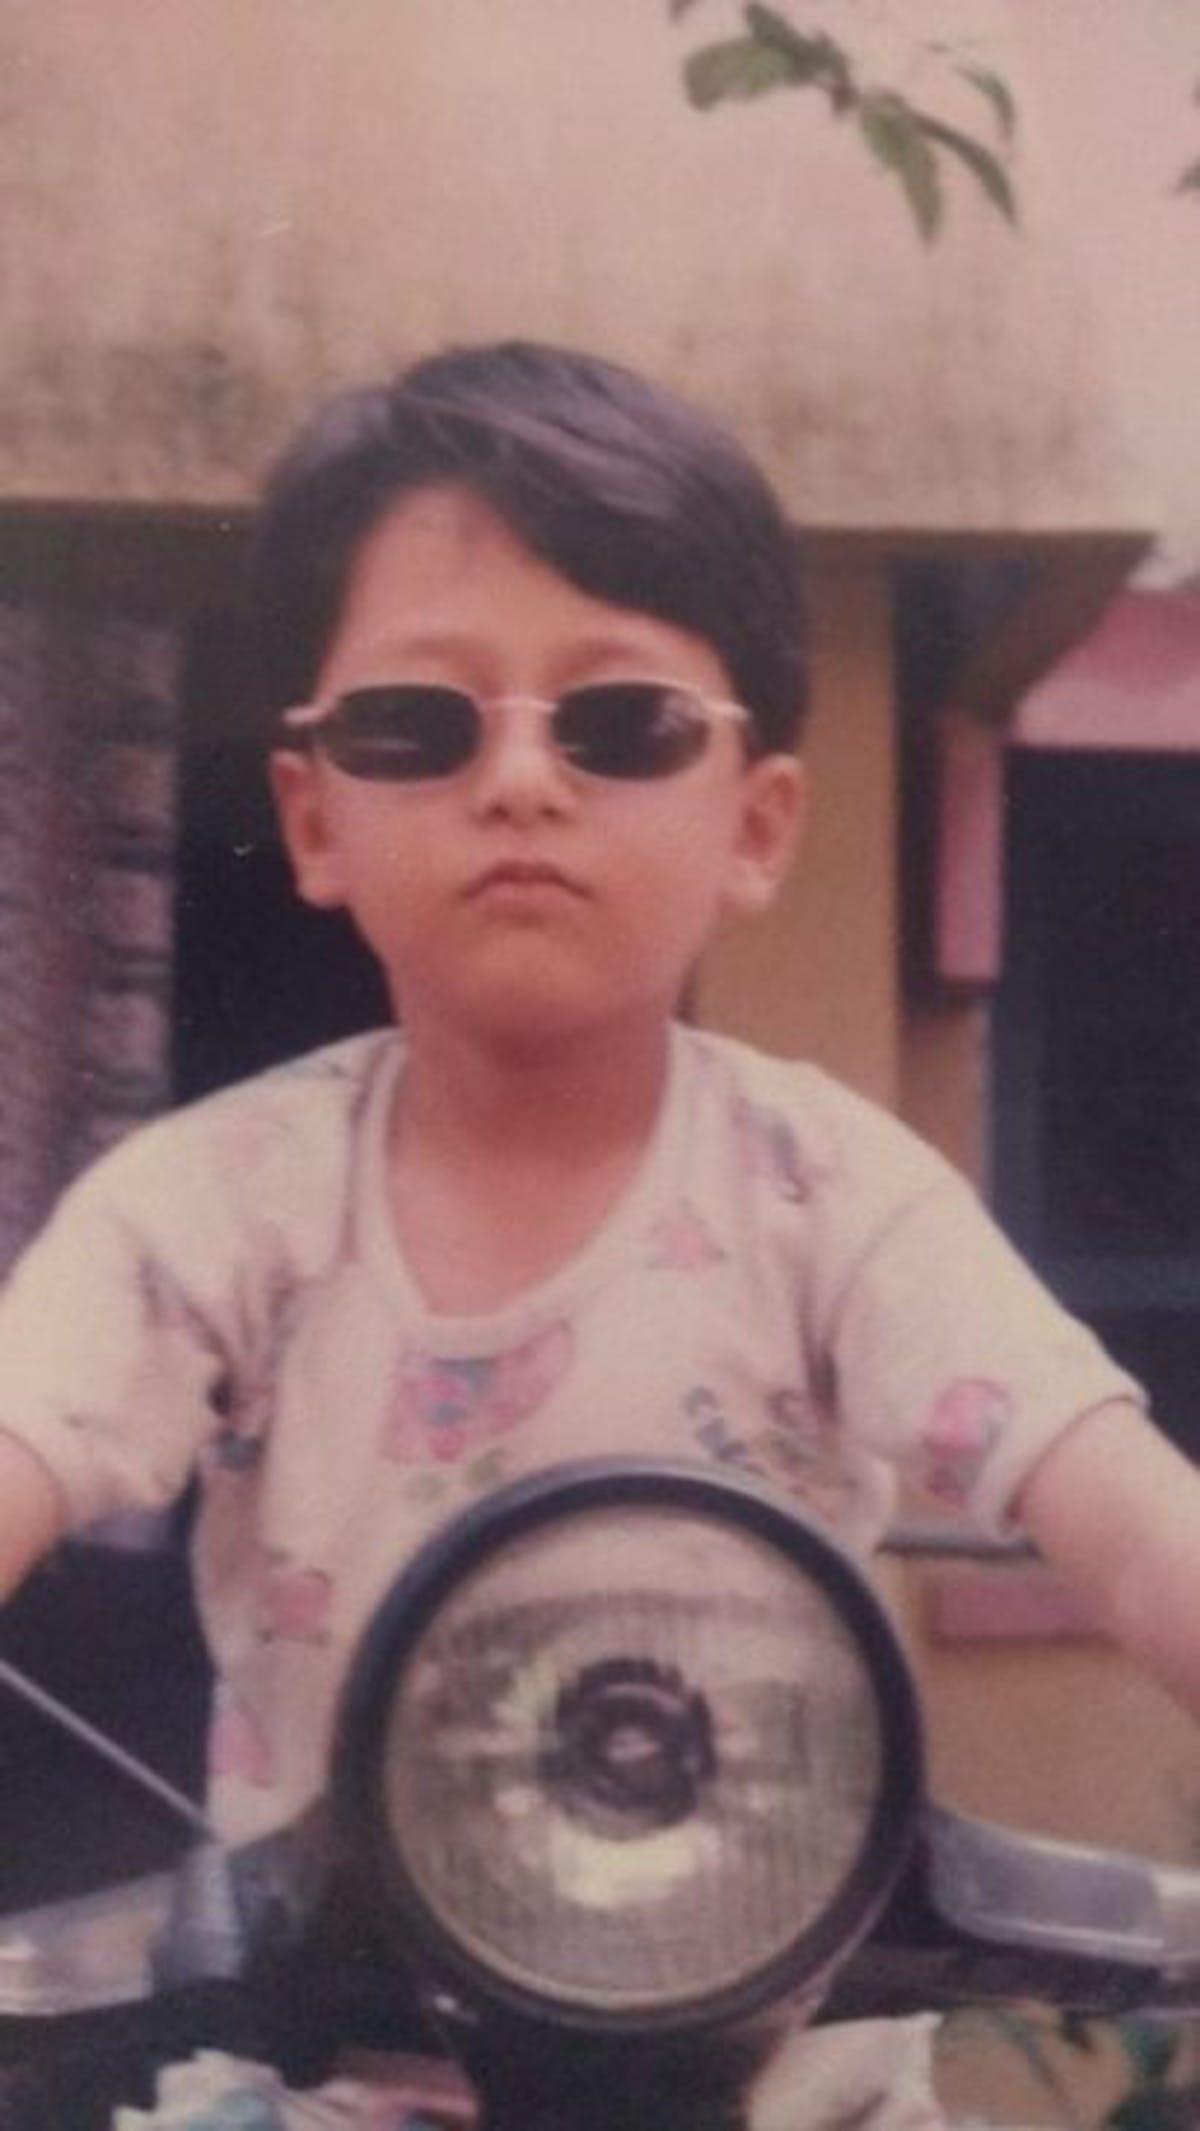 Kid with sunglasses